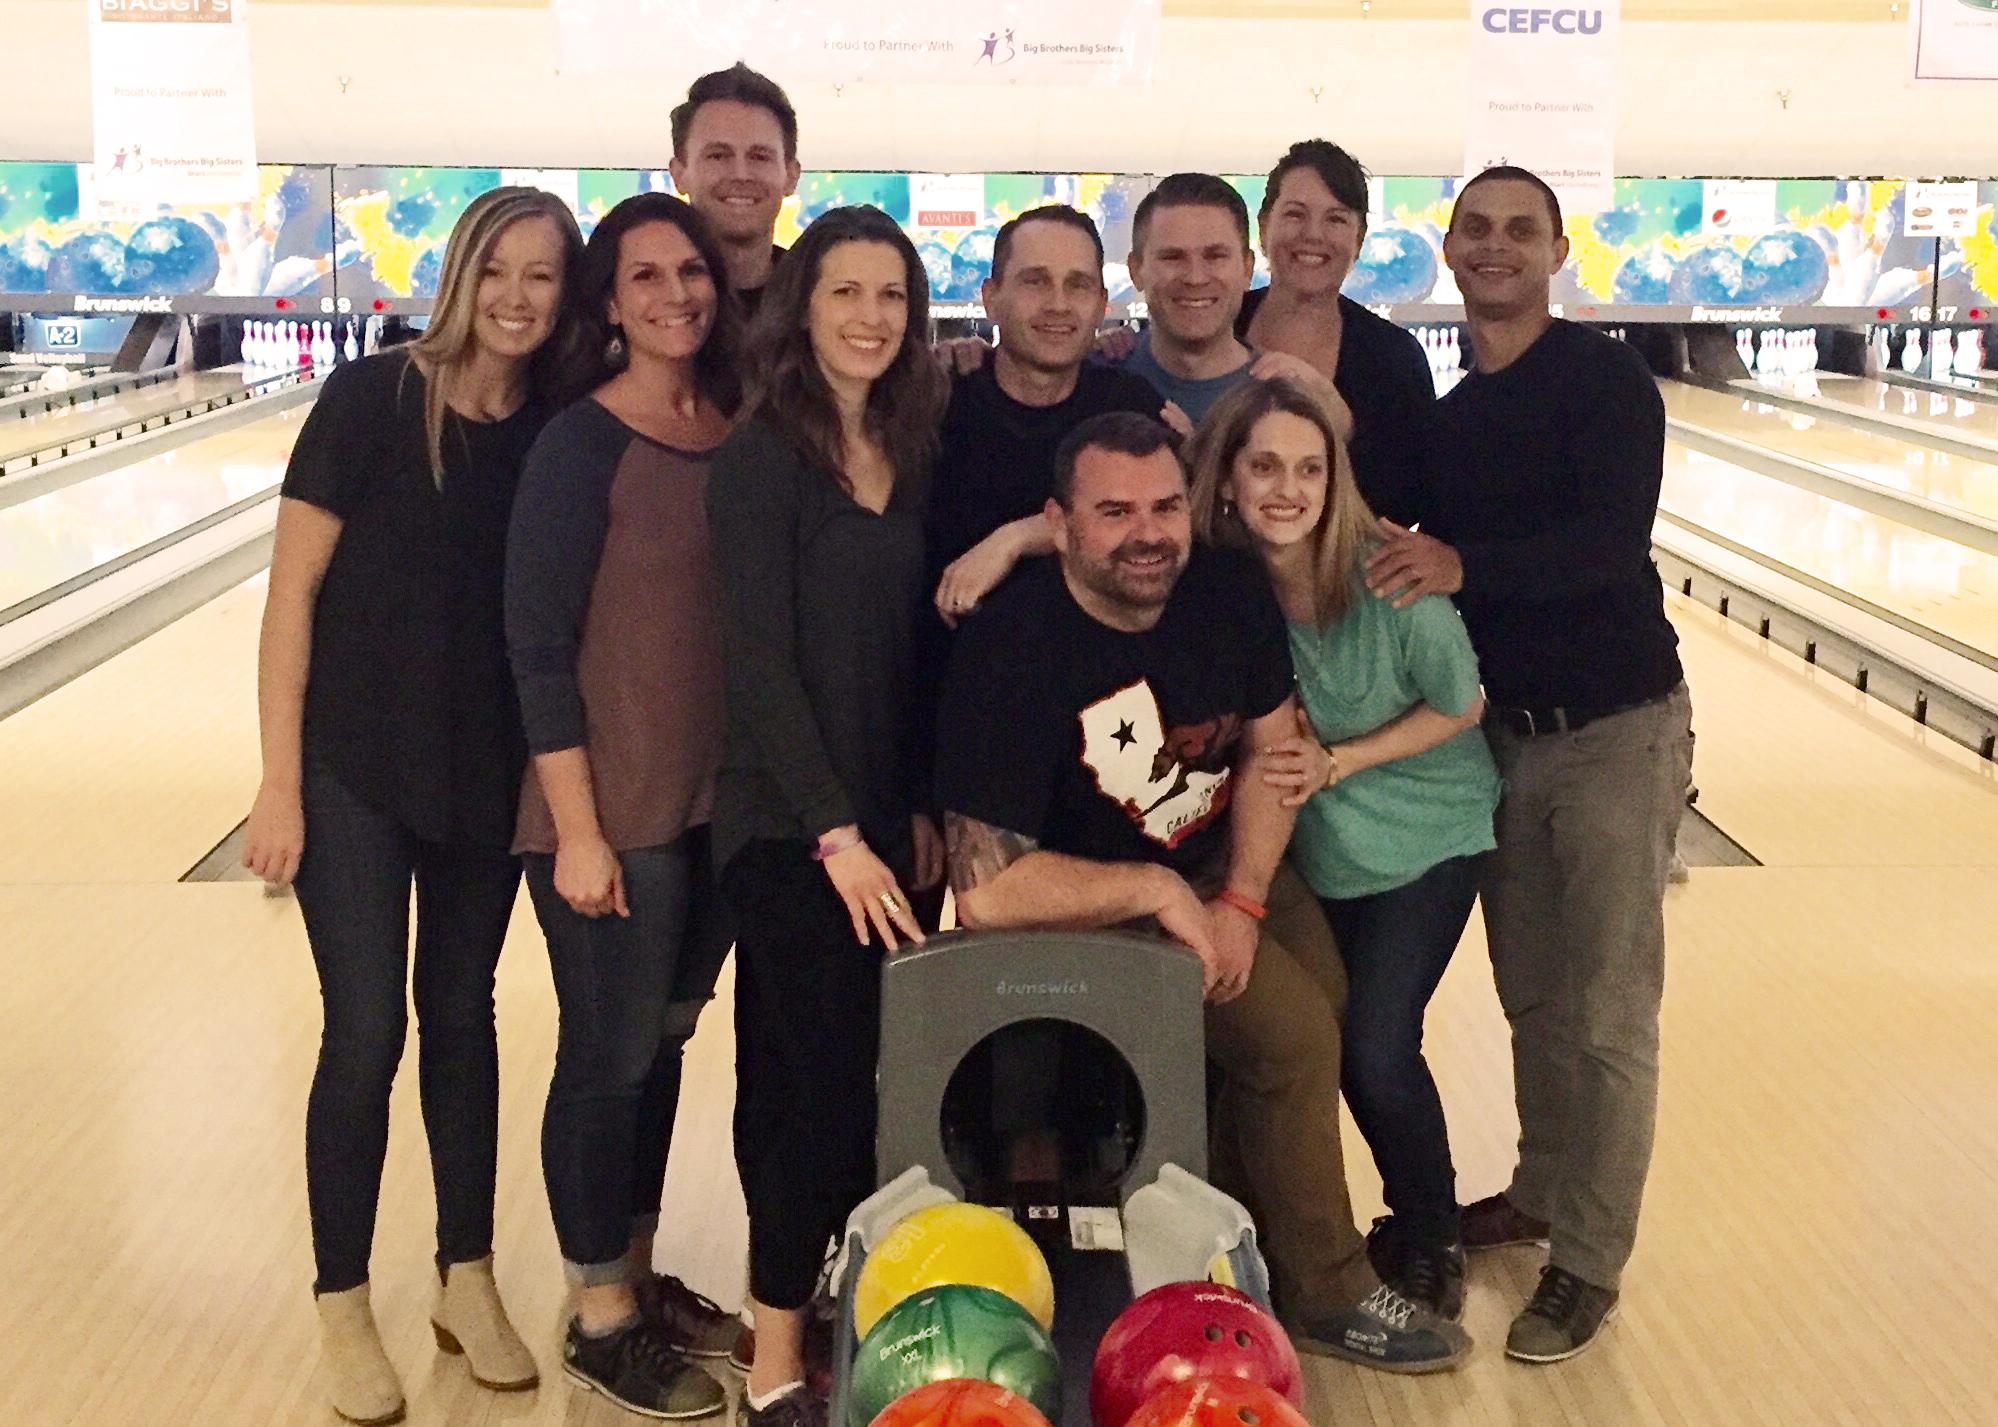 heartland_bowling_bigbrothersbigsisters.JPG